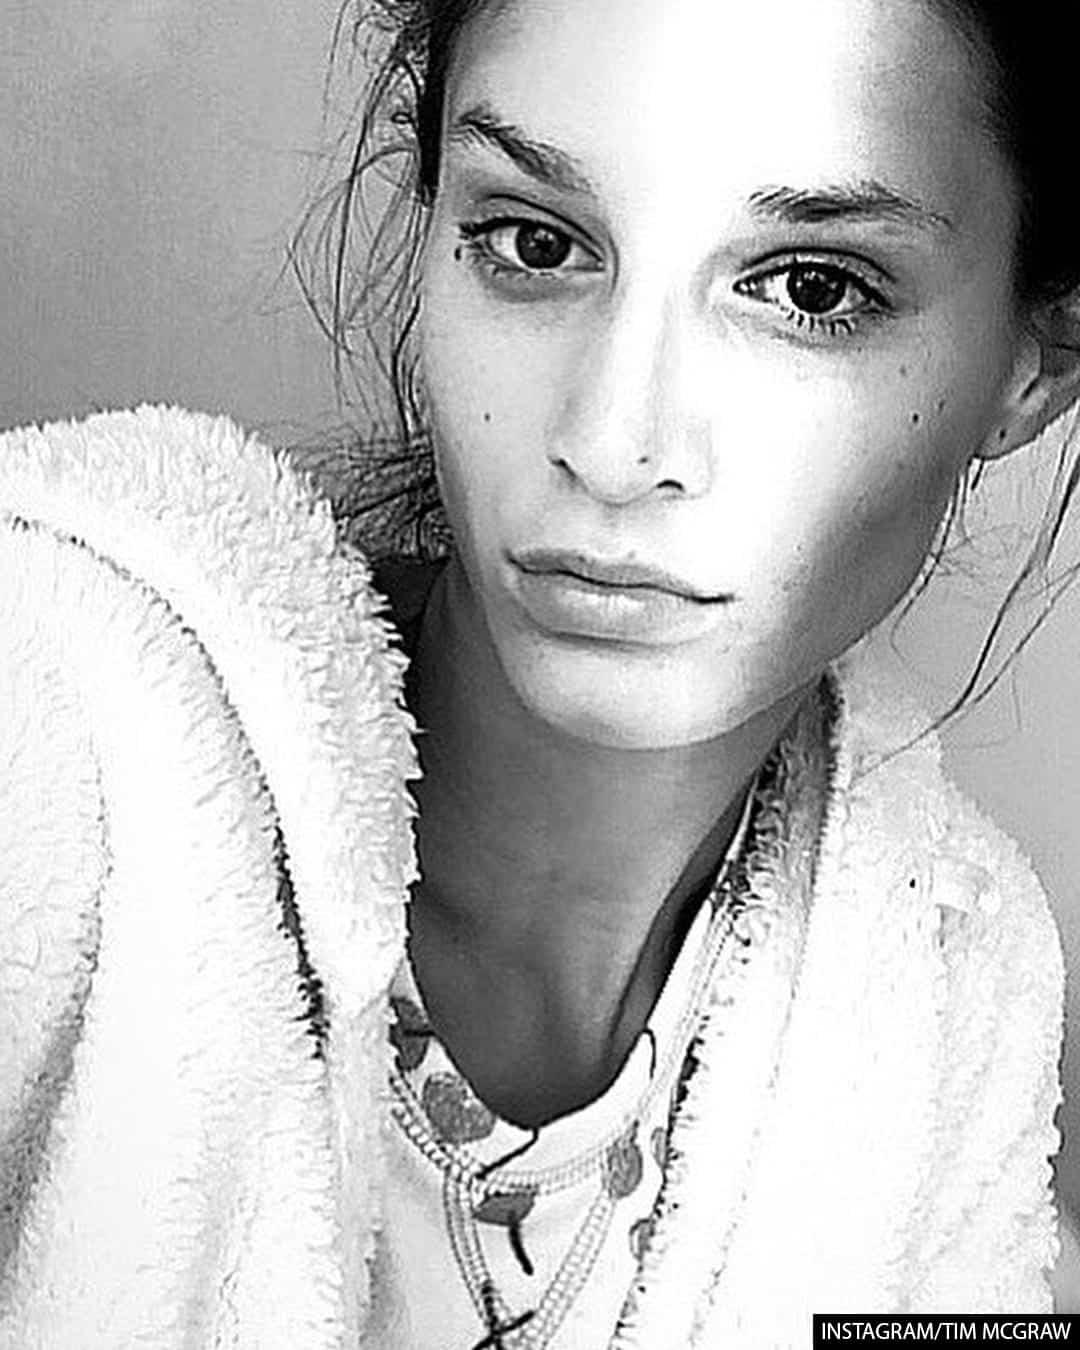 Audrey Caroline McGraw